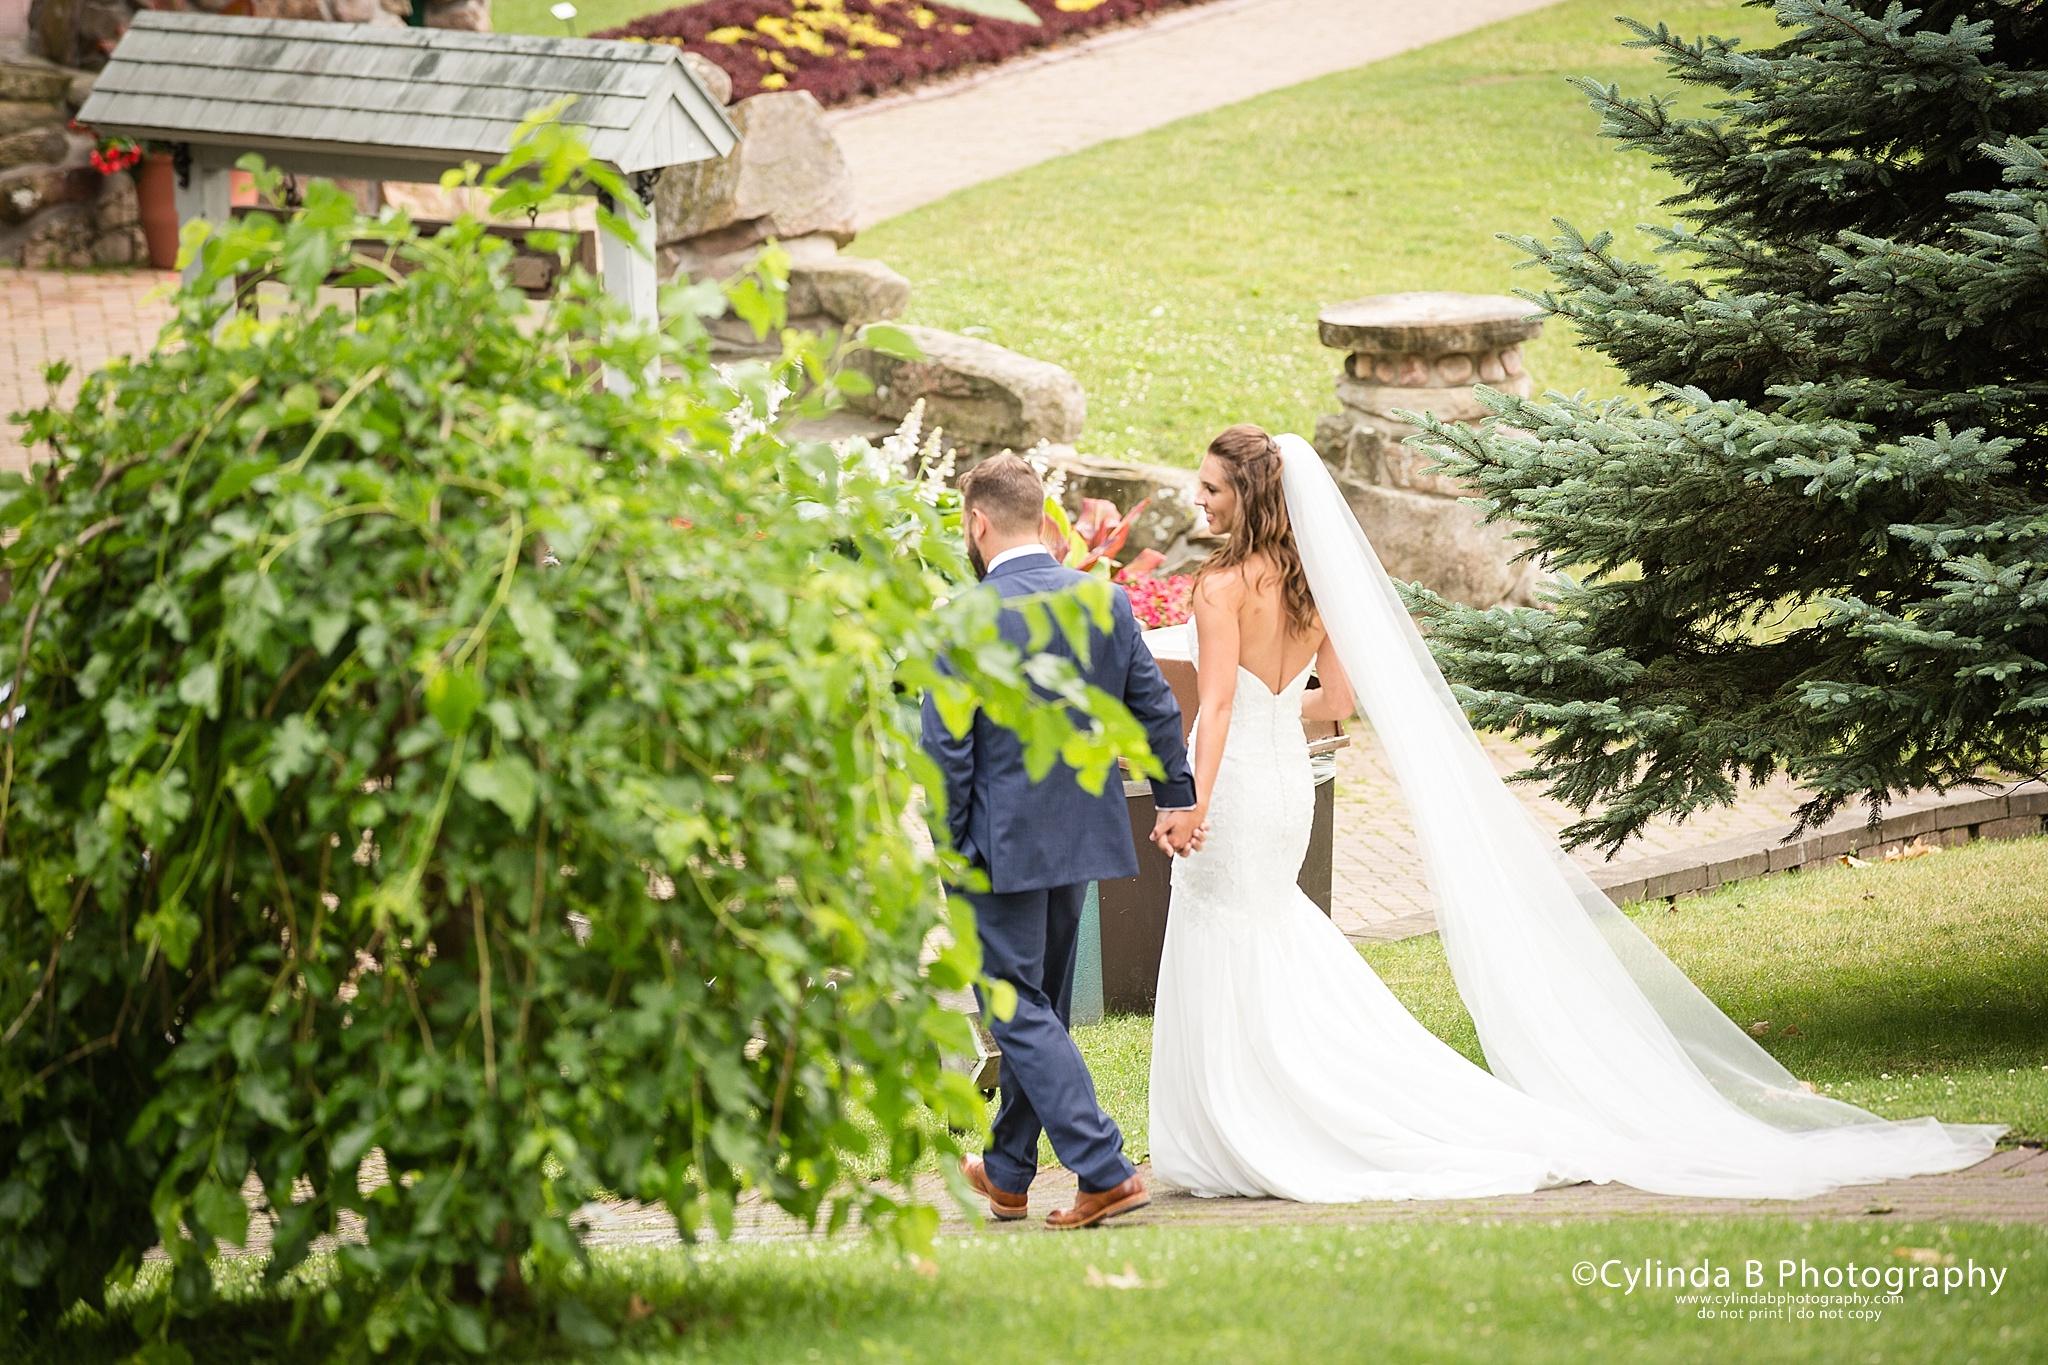 Boldt Castle Wedding, Alexandria Bay, Wedding, Photograper, Cylinda B Photography-33